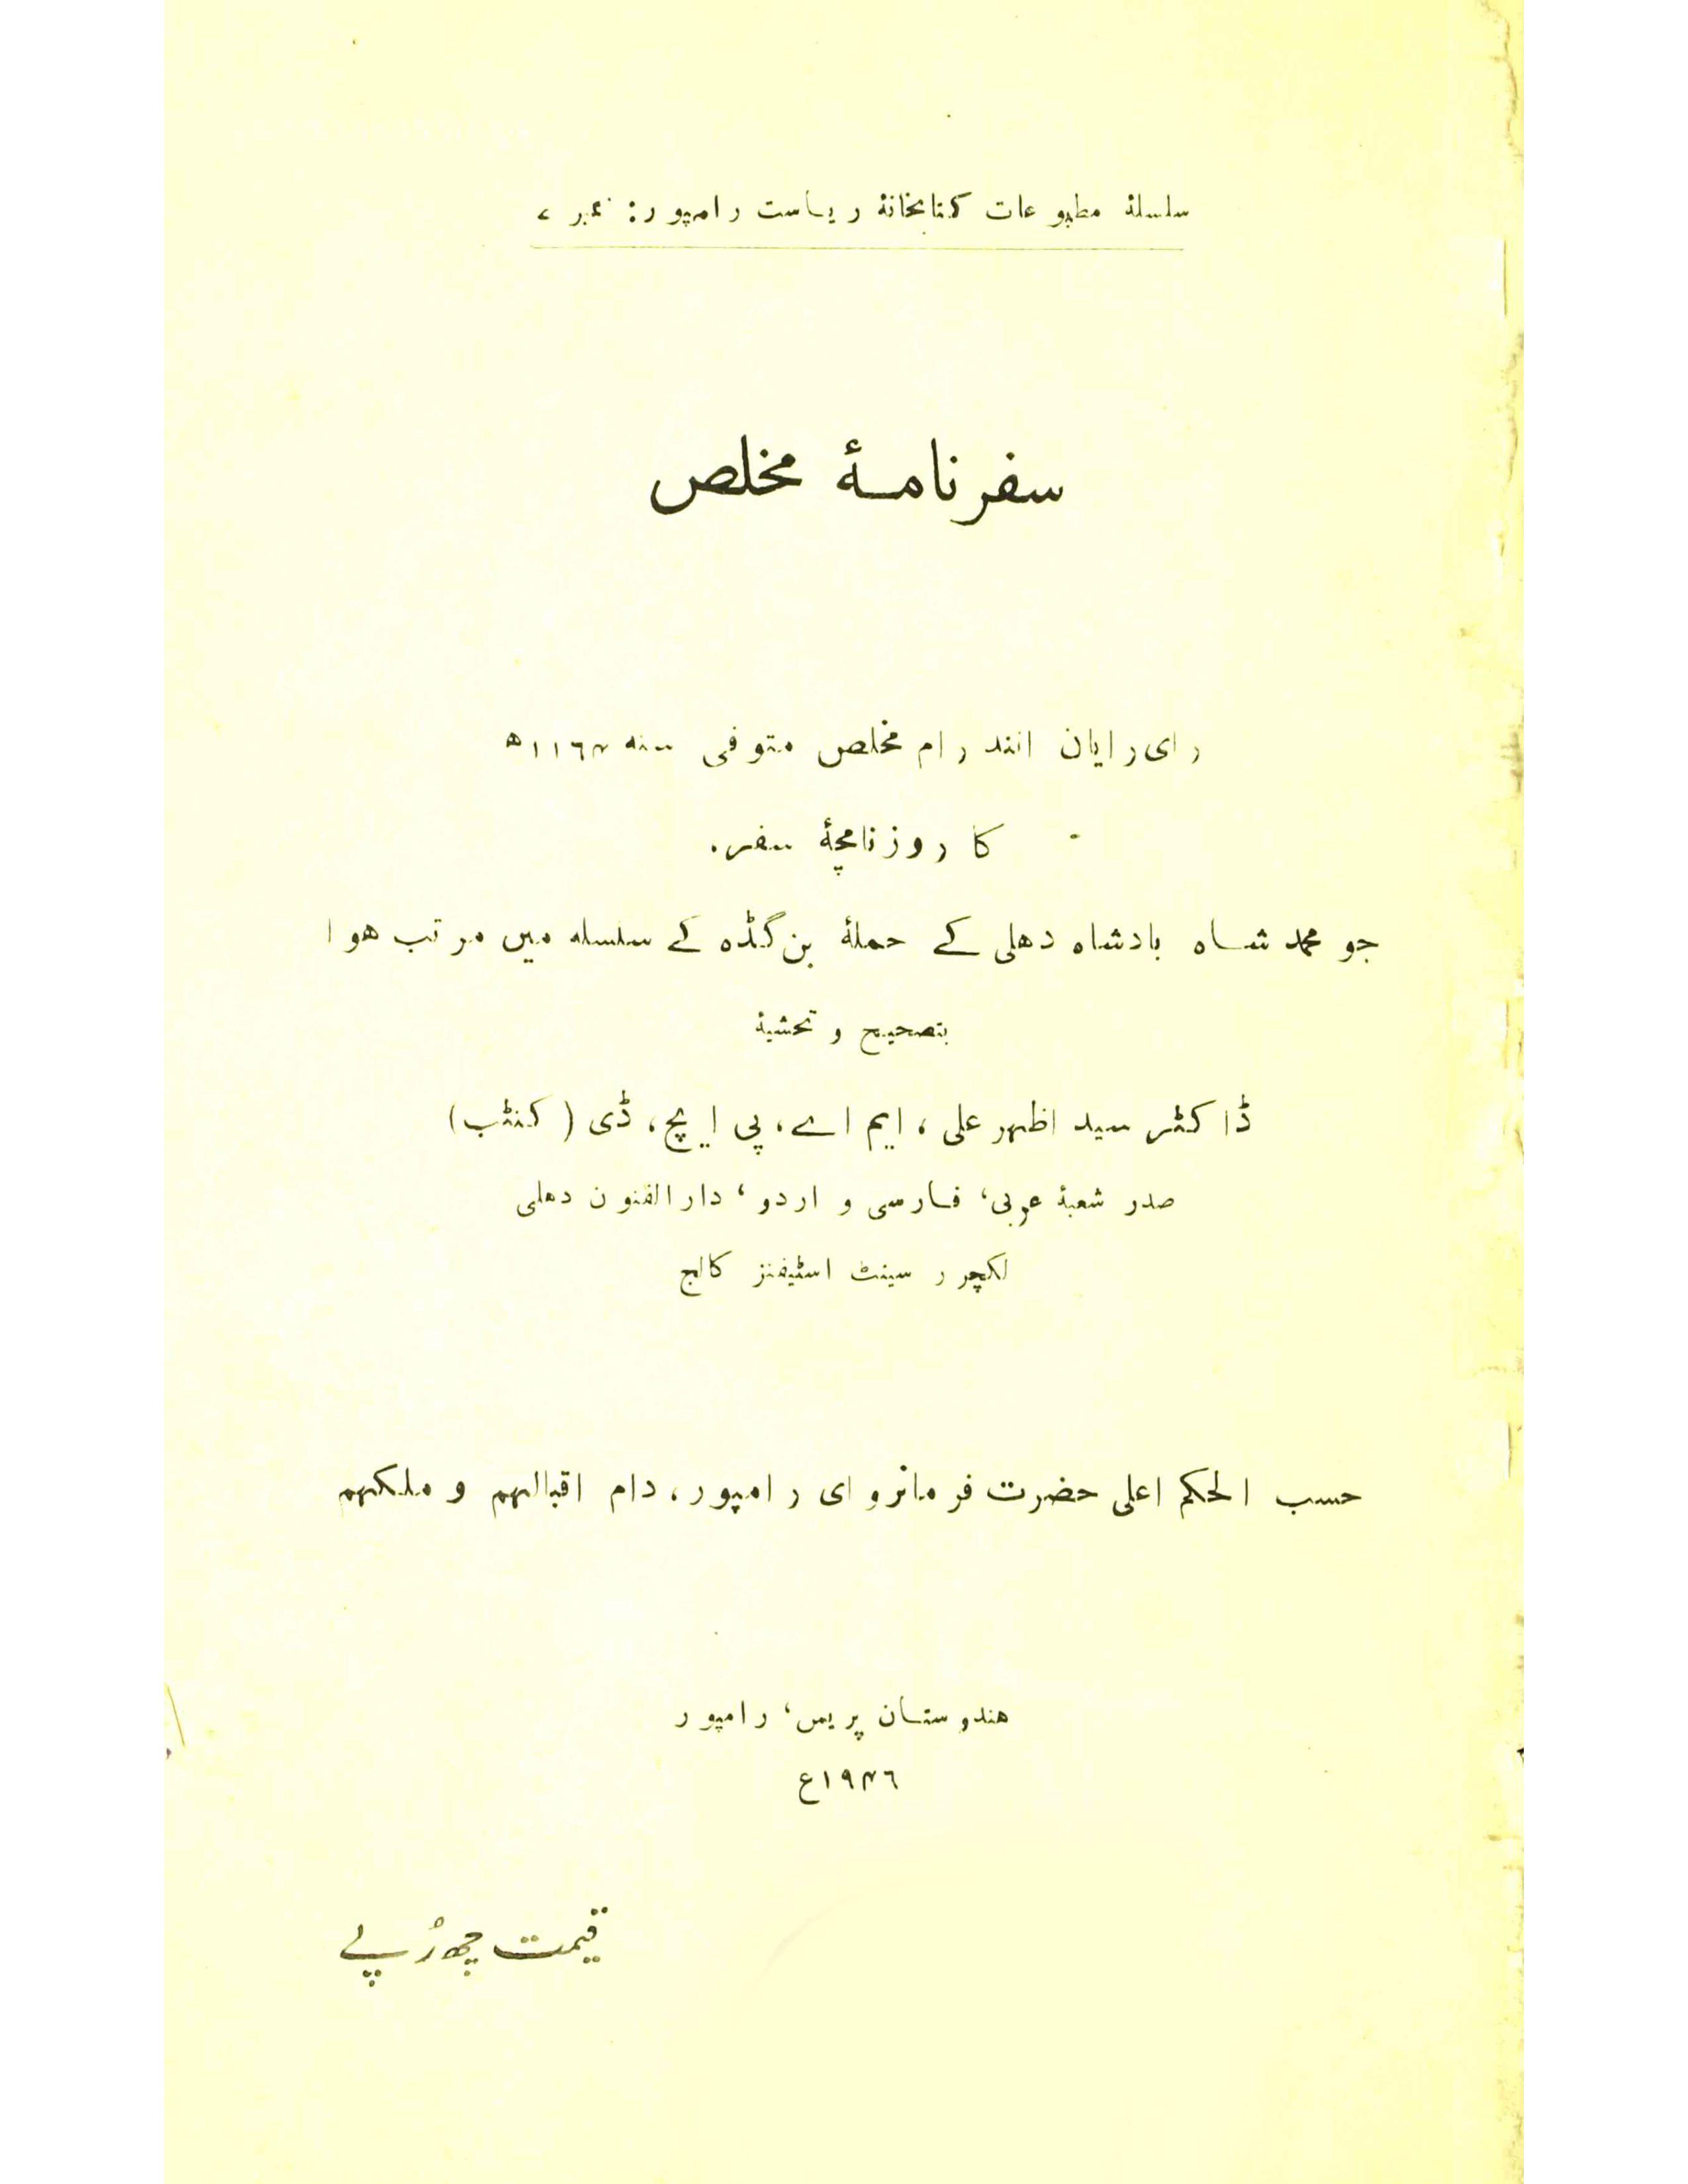 Safarnama-e-Mukhlis